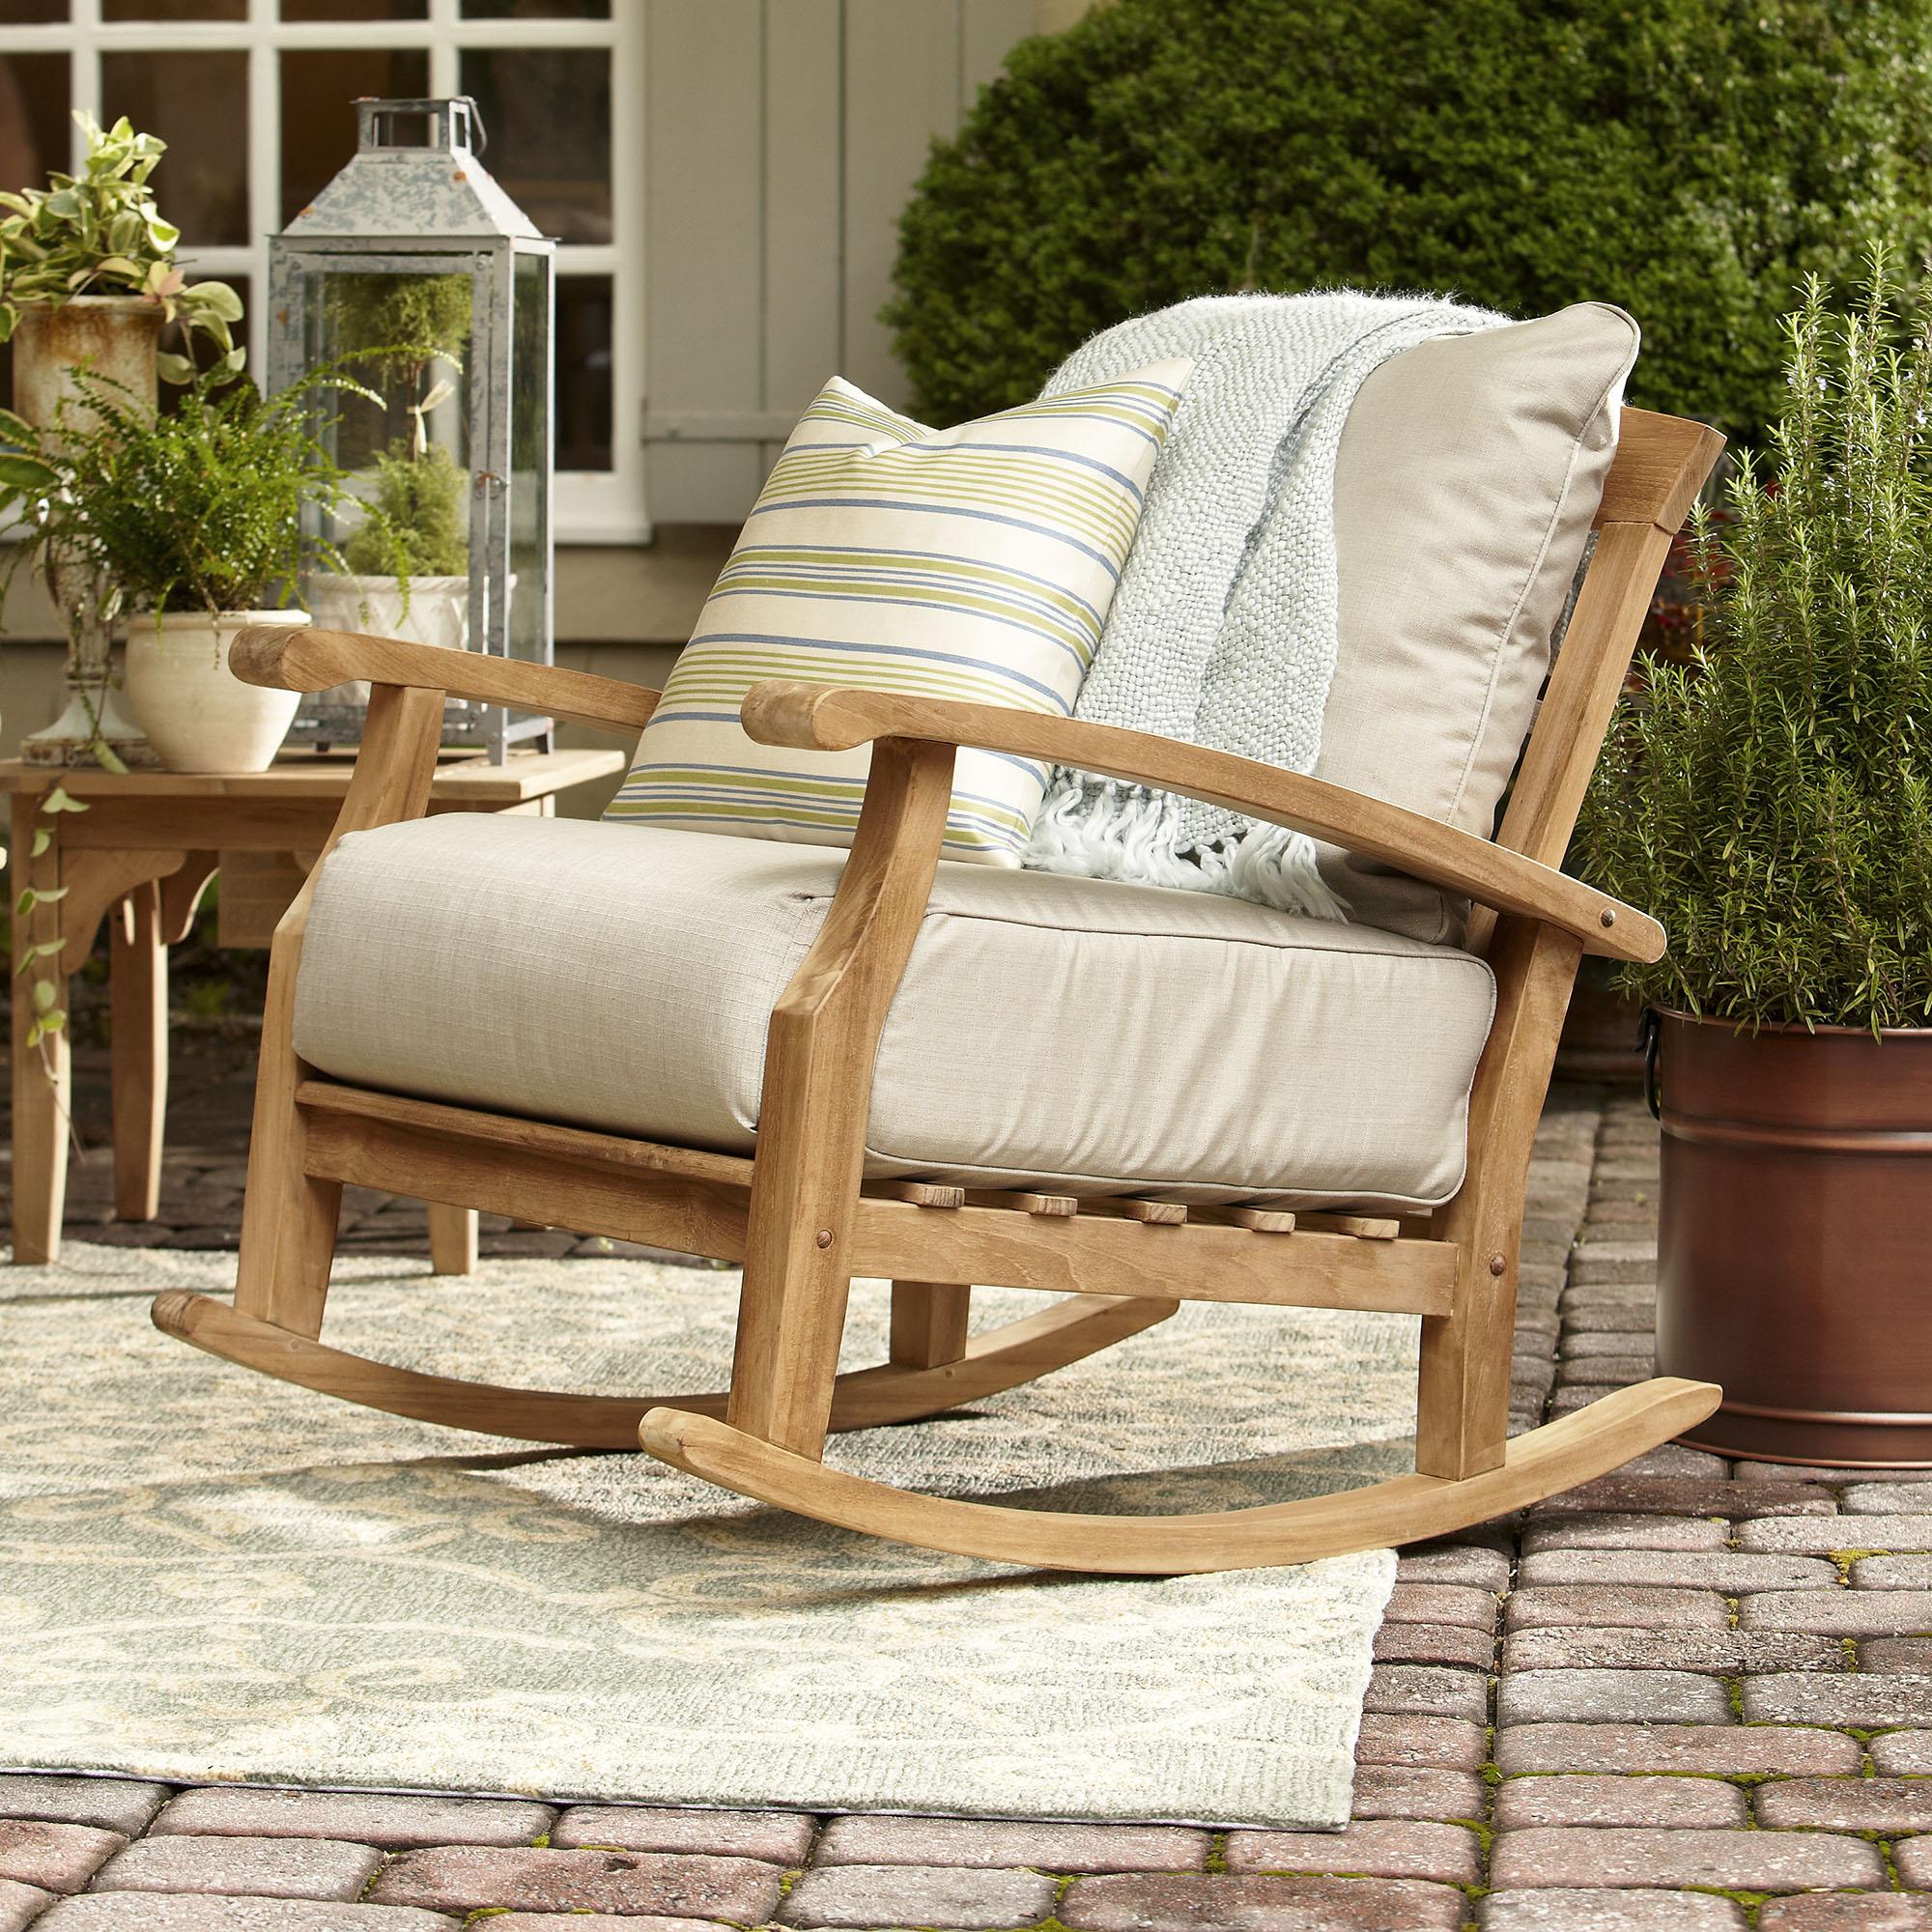 patio chairs - Patio Chair